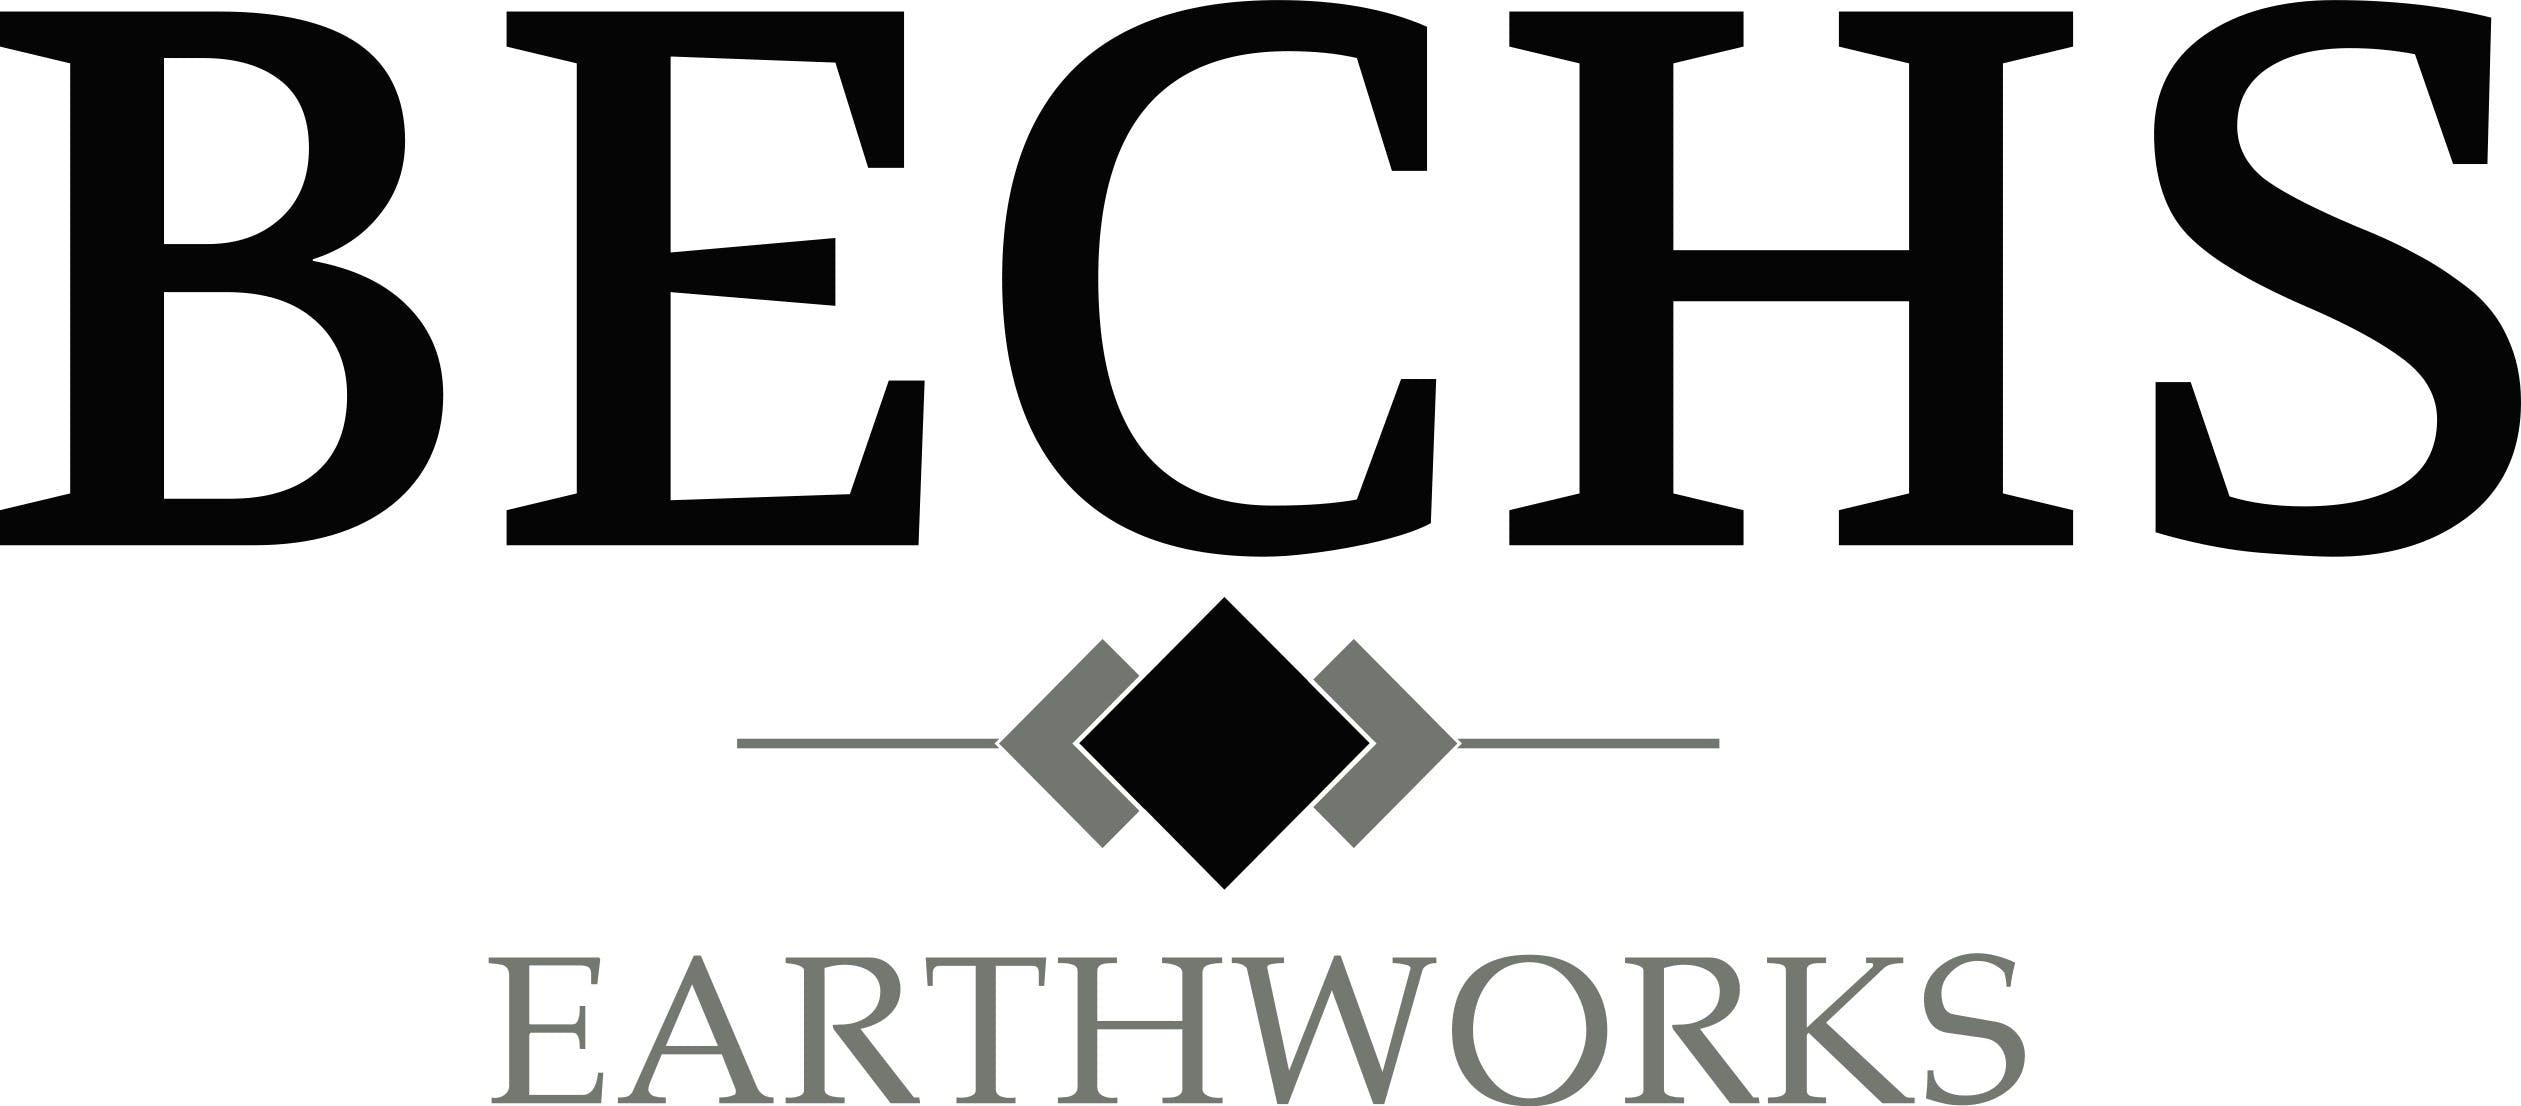 BECHS EARTHWORKS